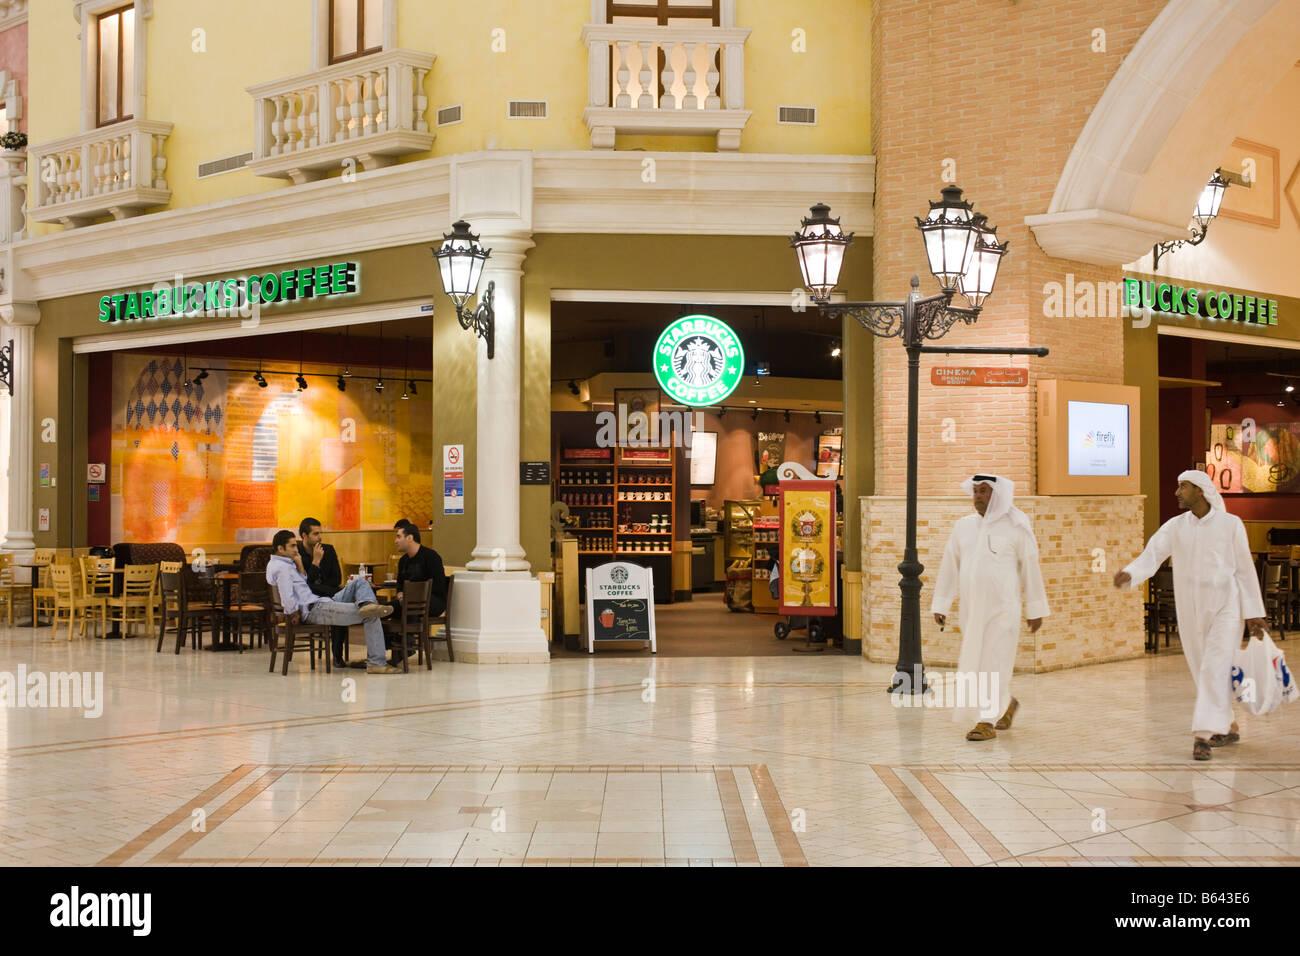 Starbucks, Villaggio Mall, Doha, Qatar Imagen De Stock